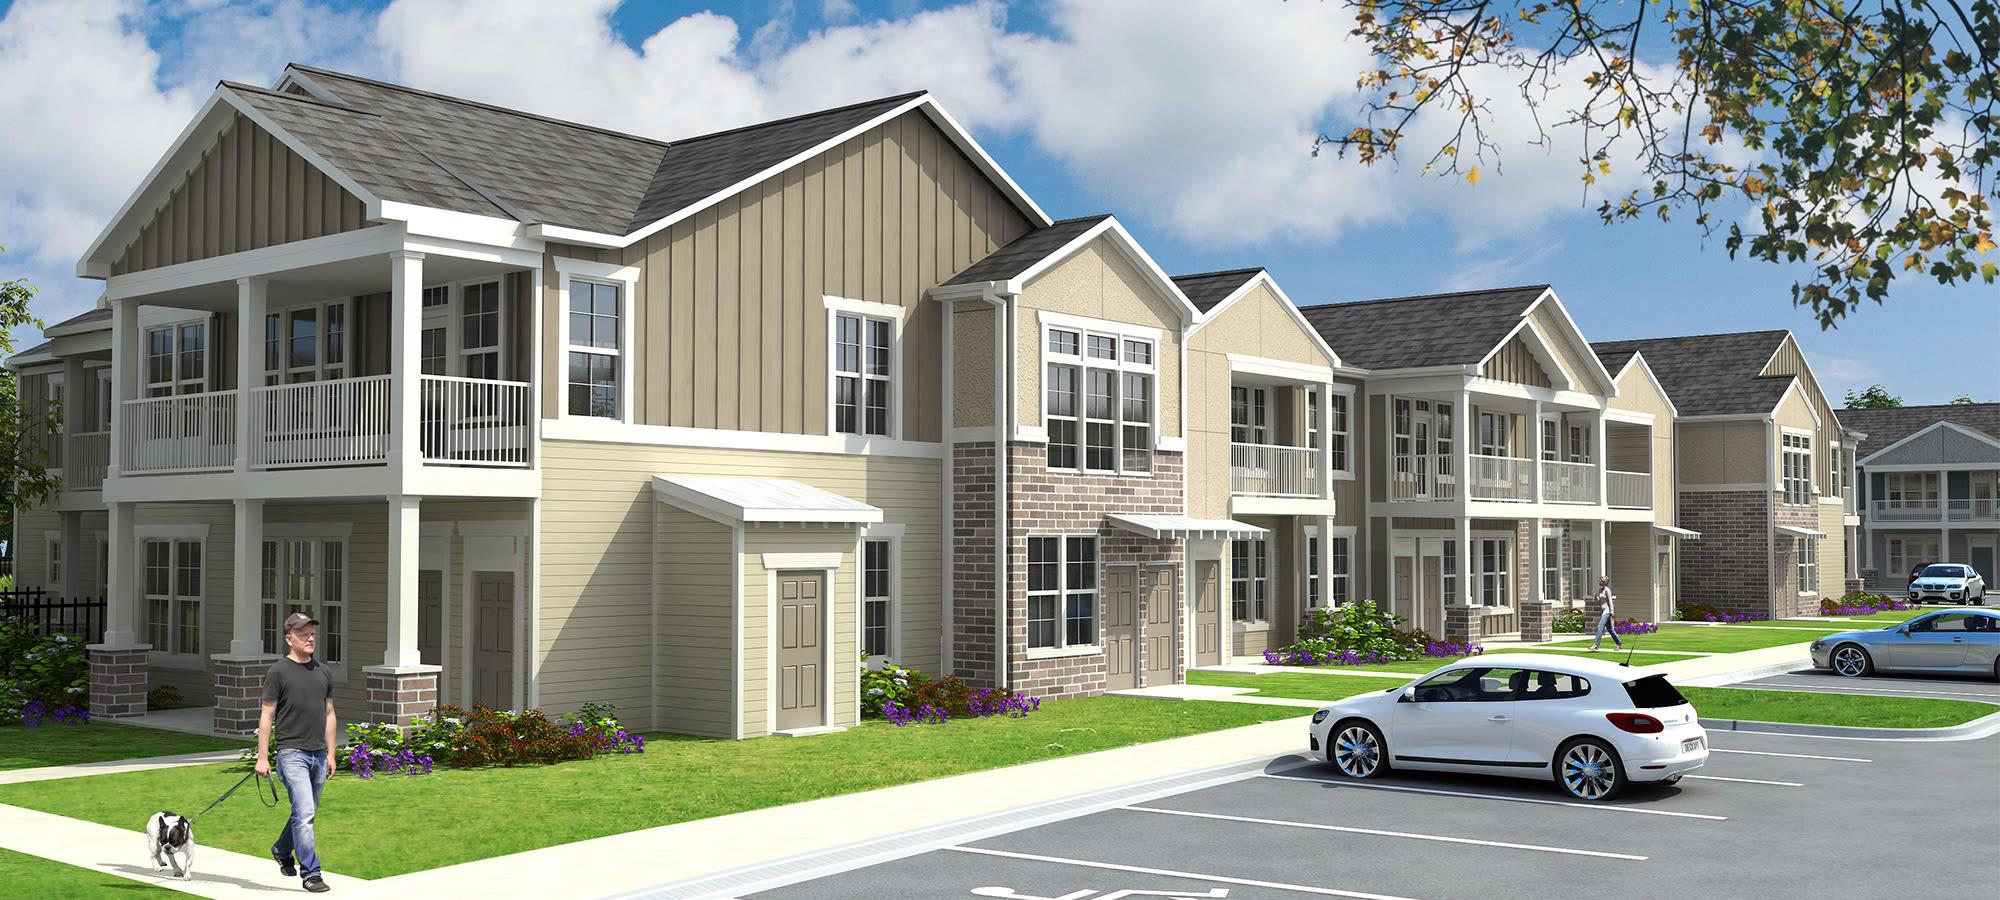 Apartments at Springs at La Grange at Louisville, Kentucky